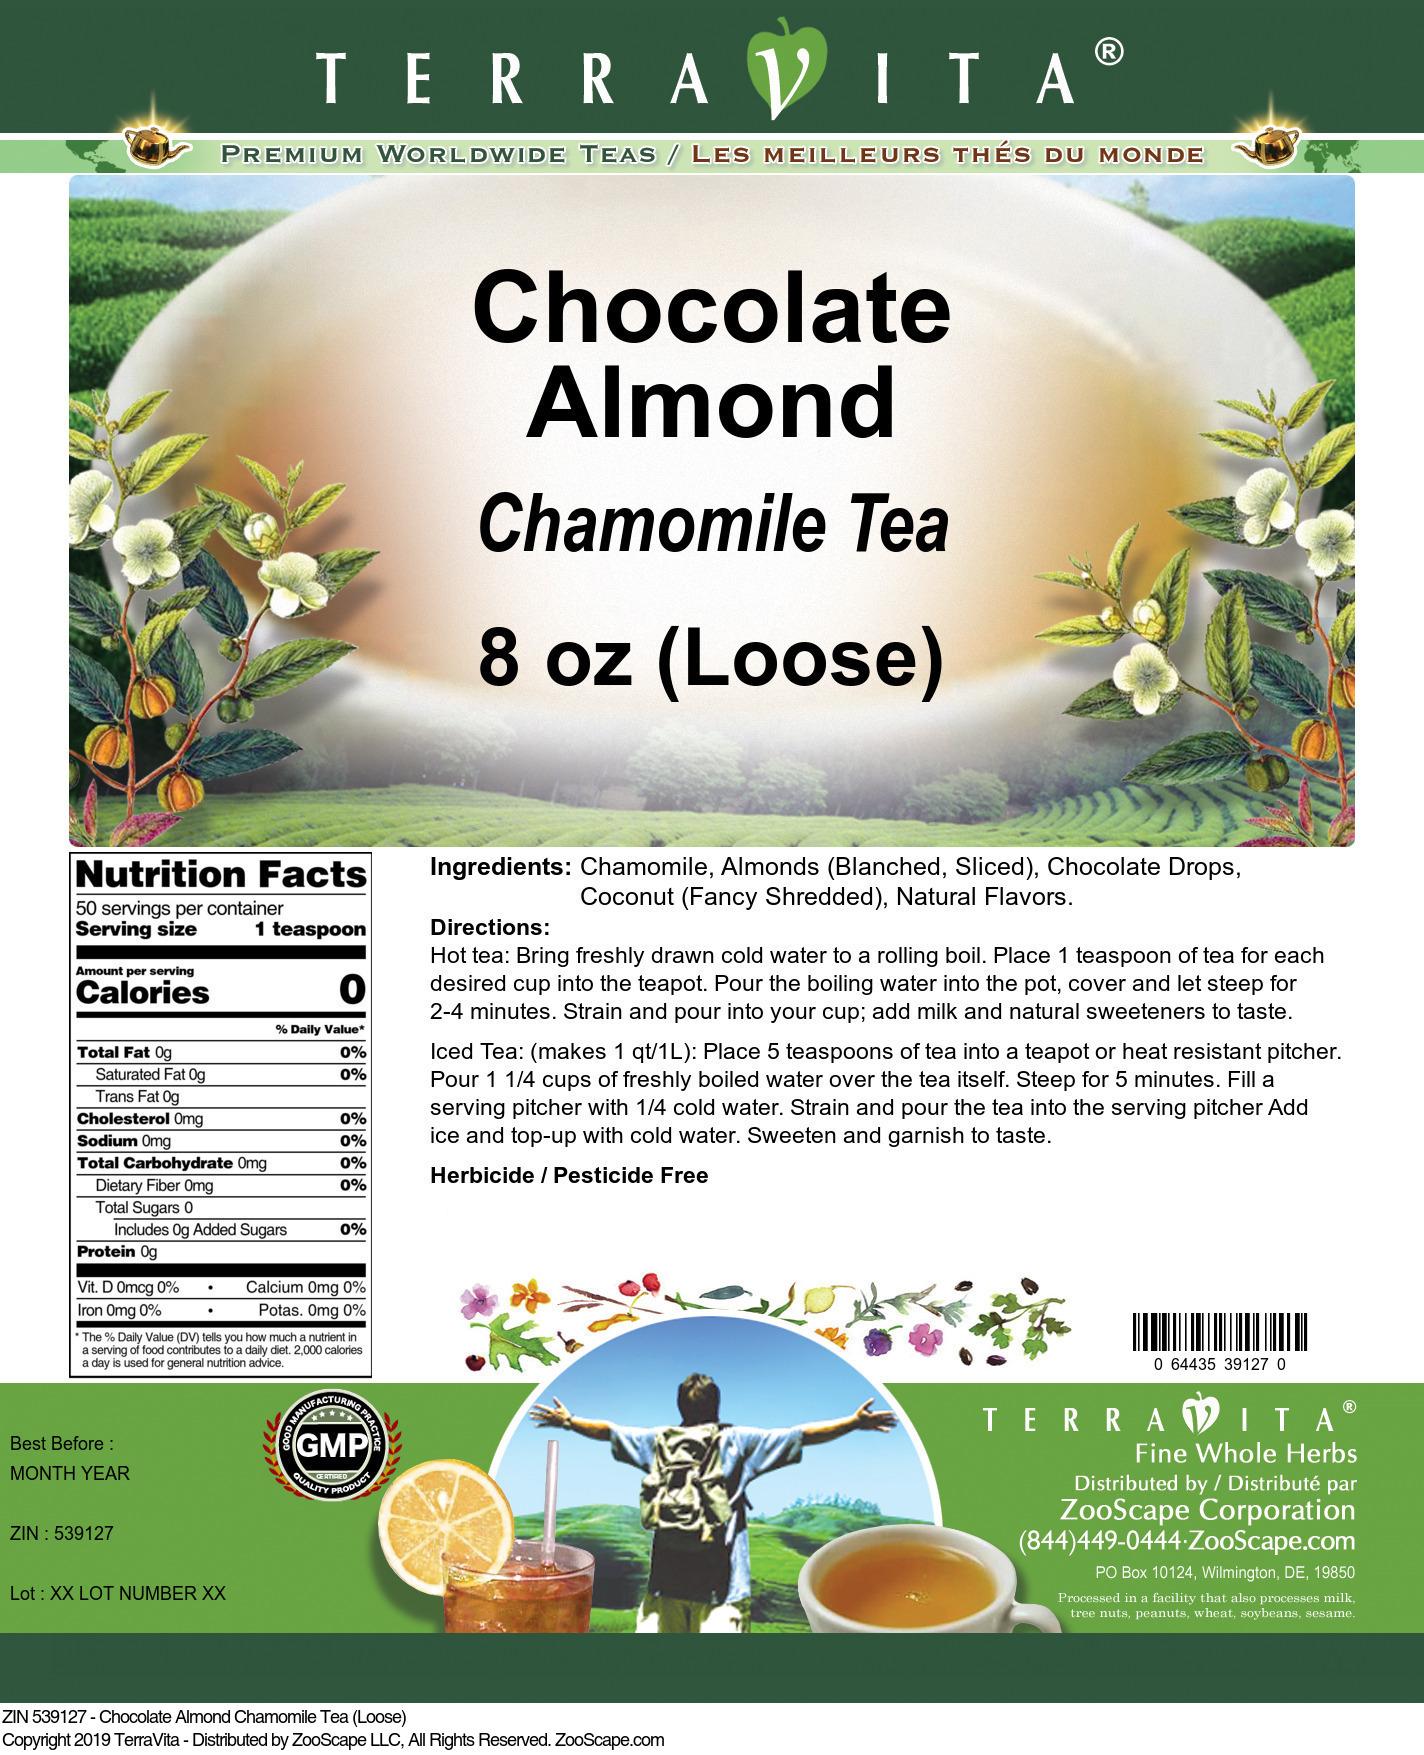 Chocolate Almond Chamomile Tea